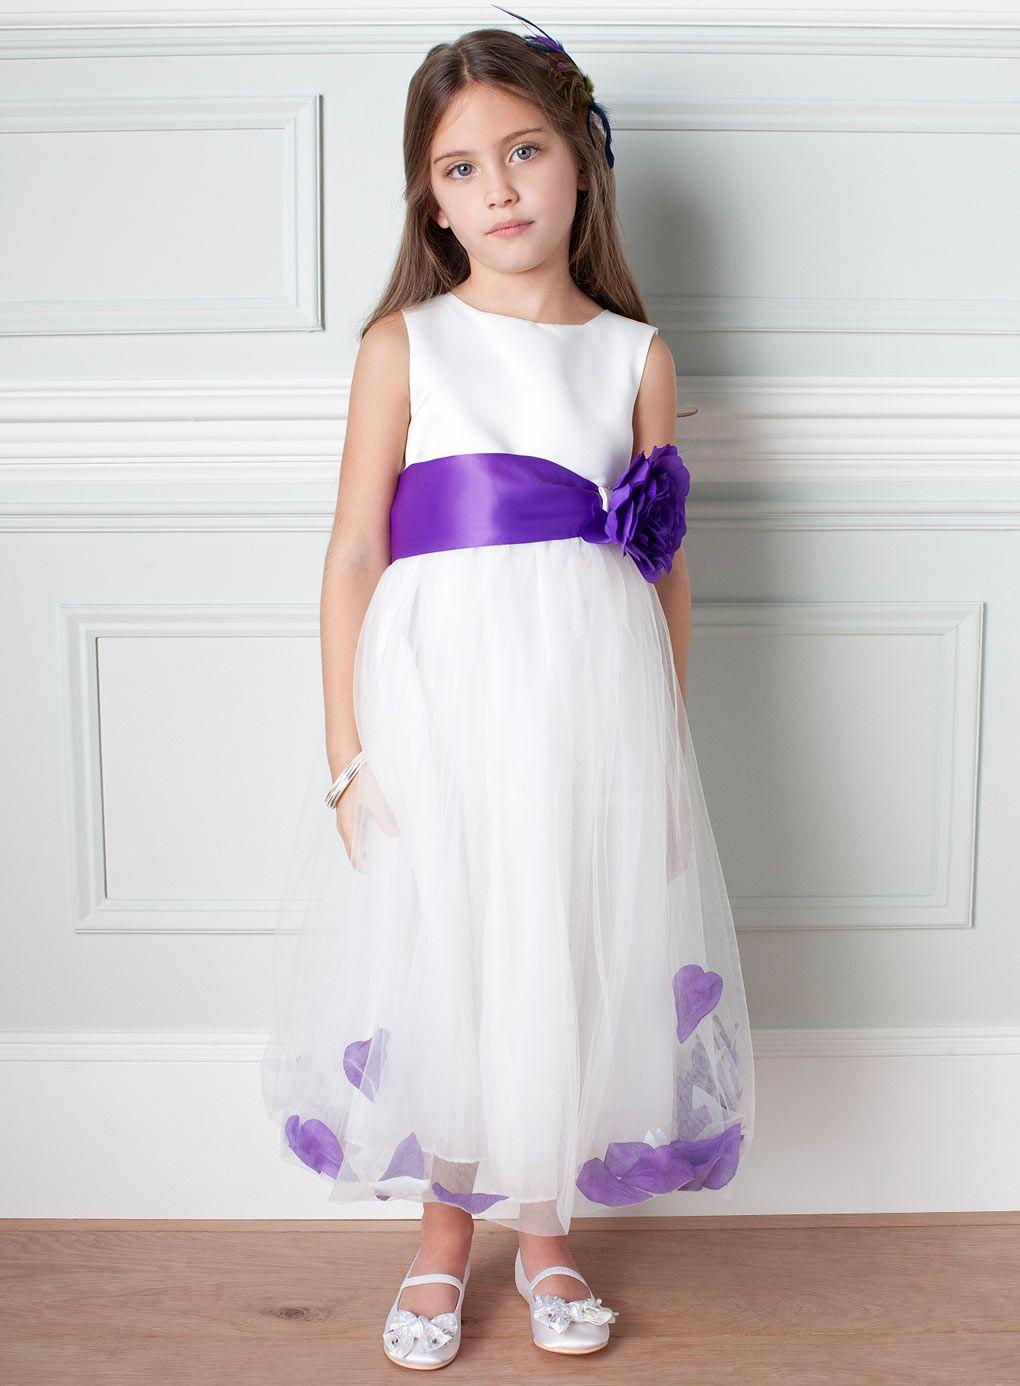 purple wedding dresses Purple Bridesmaid Dress And Wedding 3